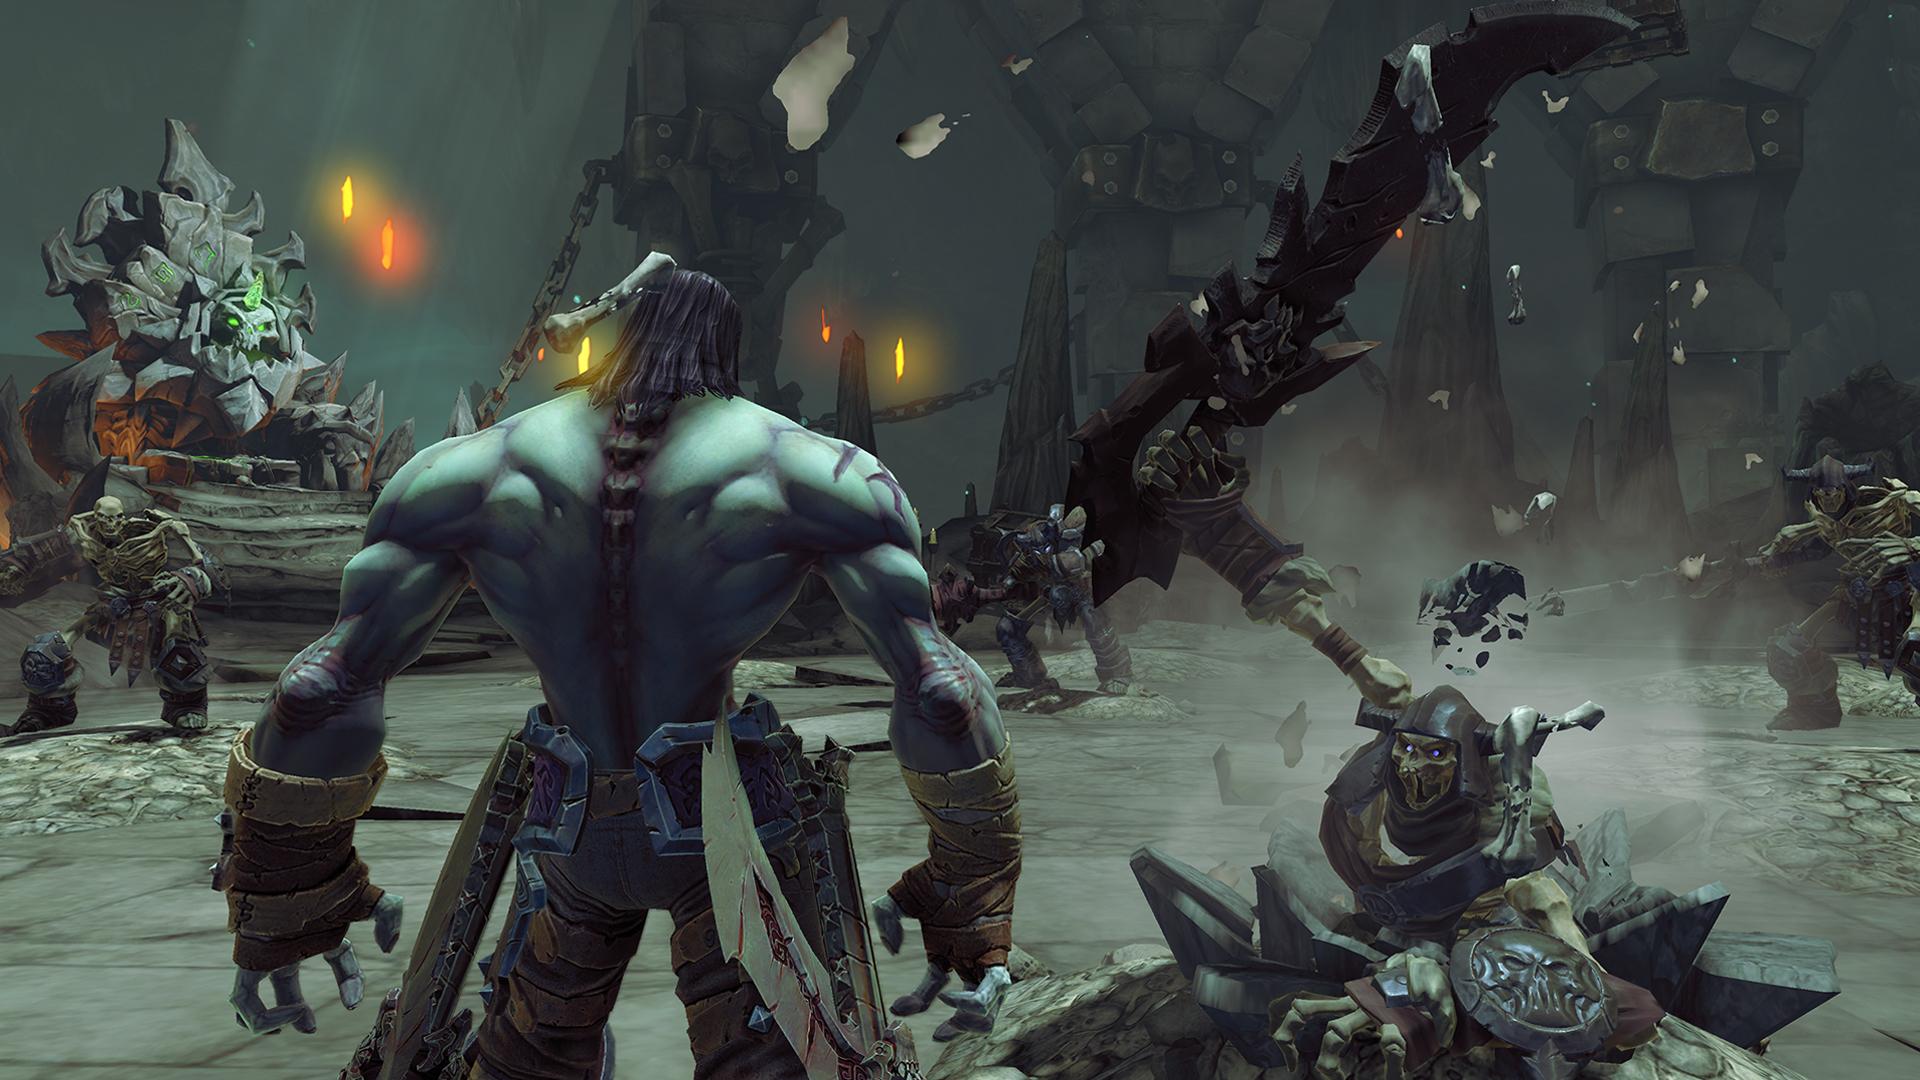 Darksiders II Deathinitive Edition image 3